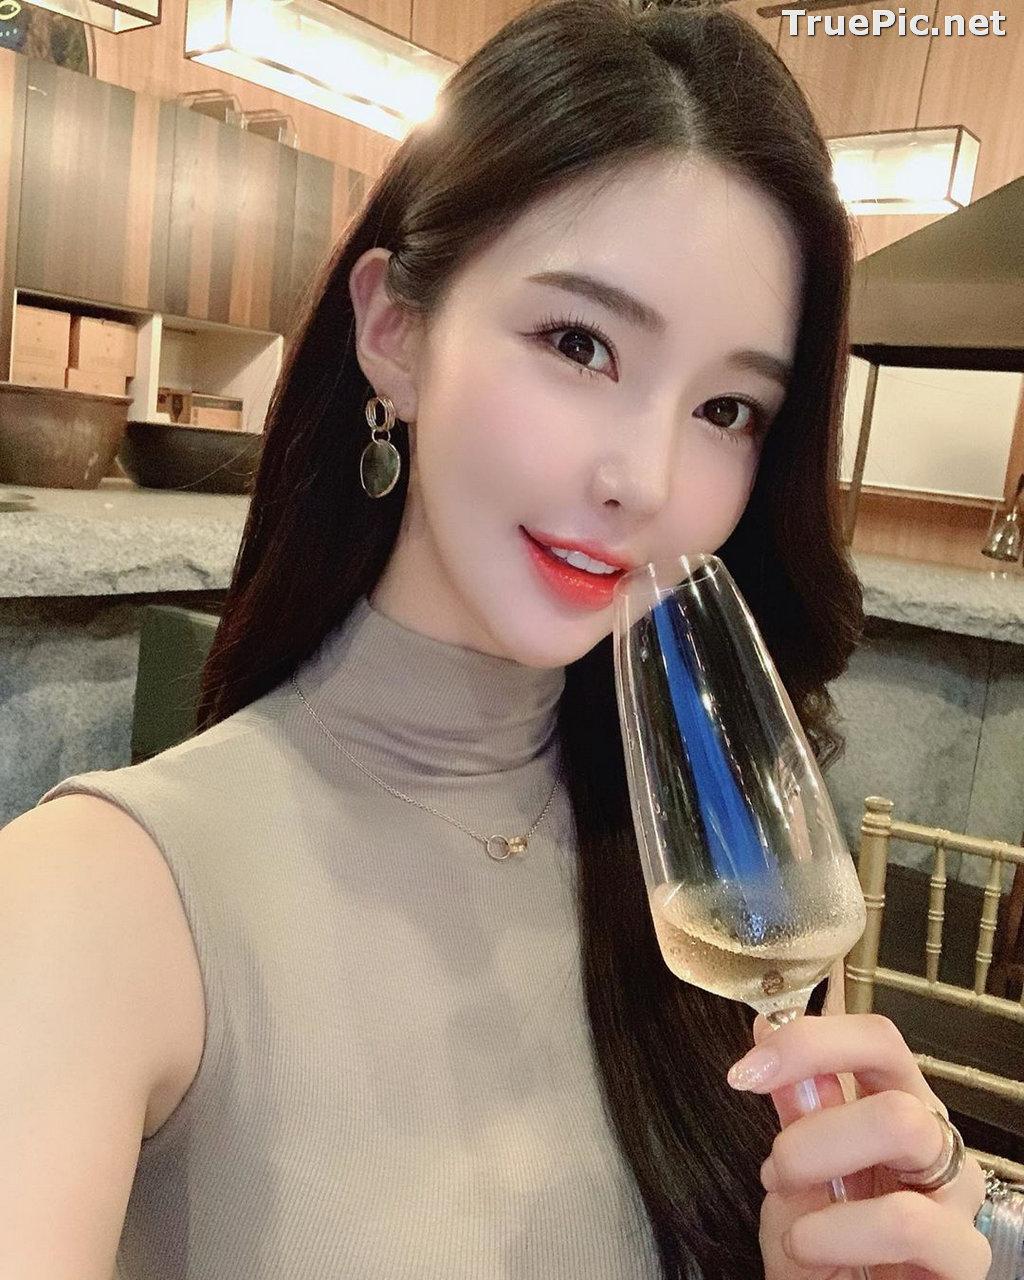 Image Korean Sexy Model - Choi Byeol Ha (최별하) Hot Photos 2020 - TruePic.net - Picture-9